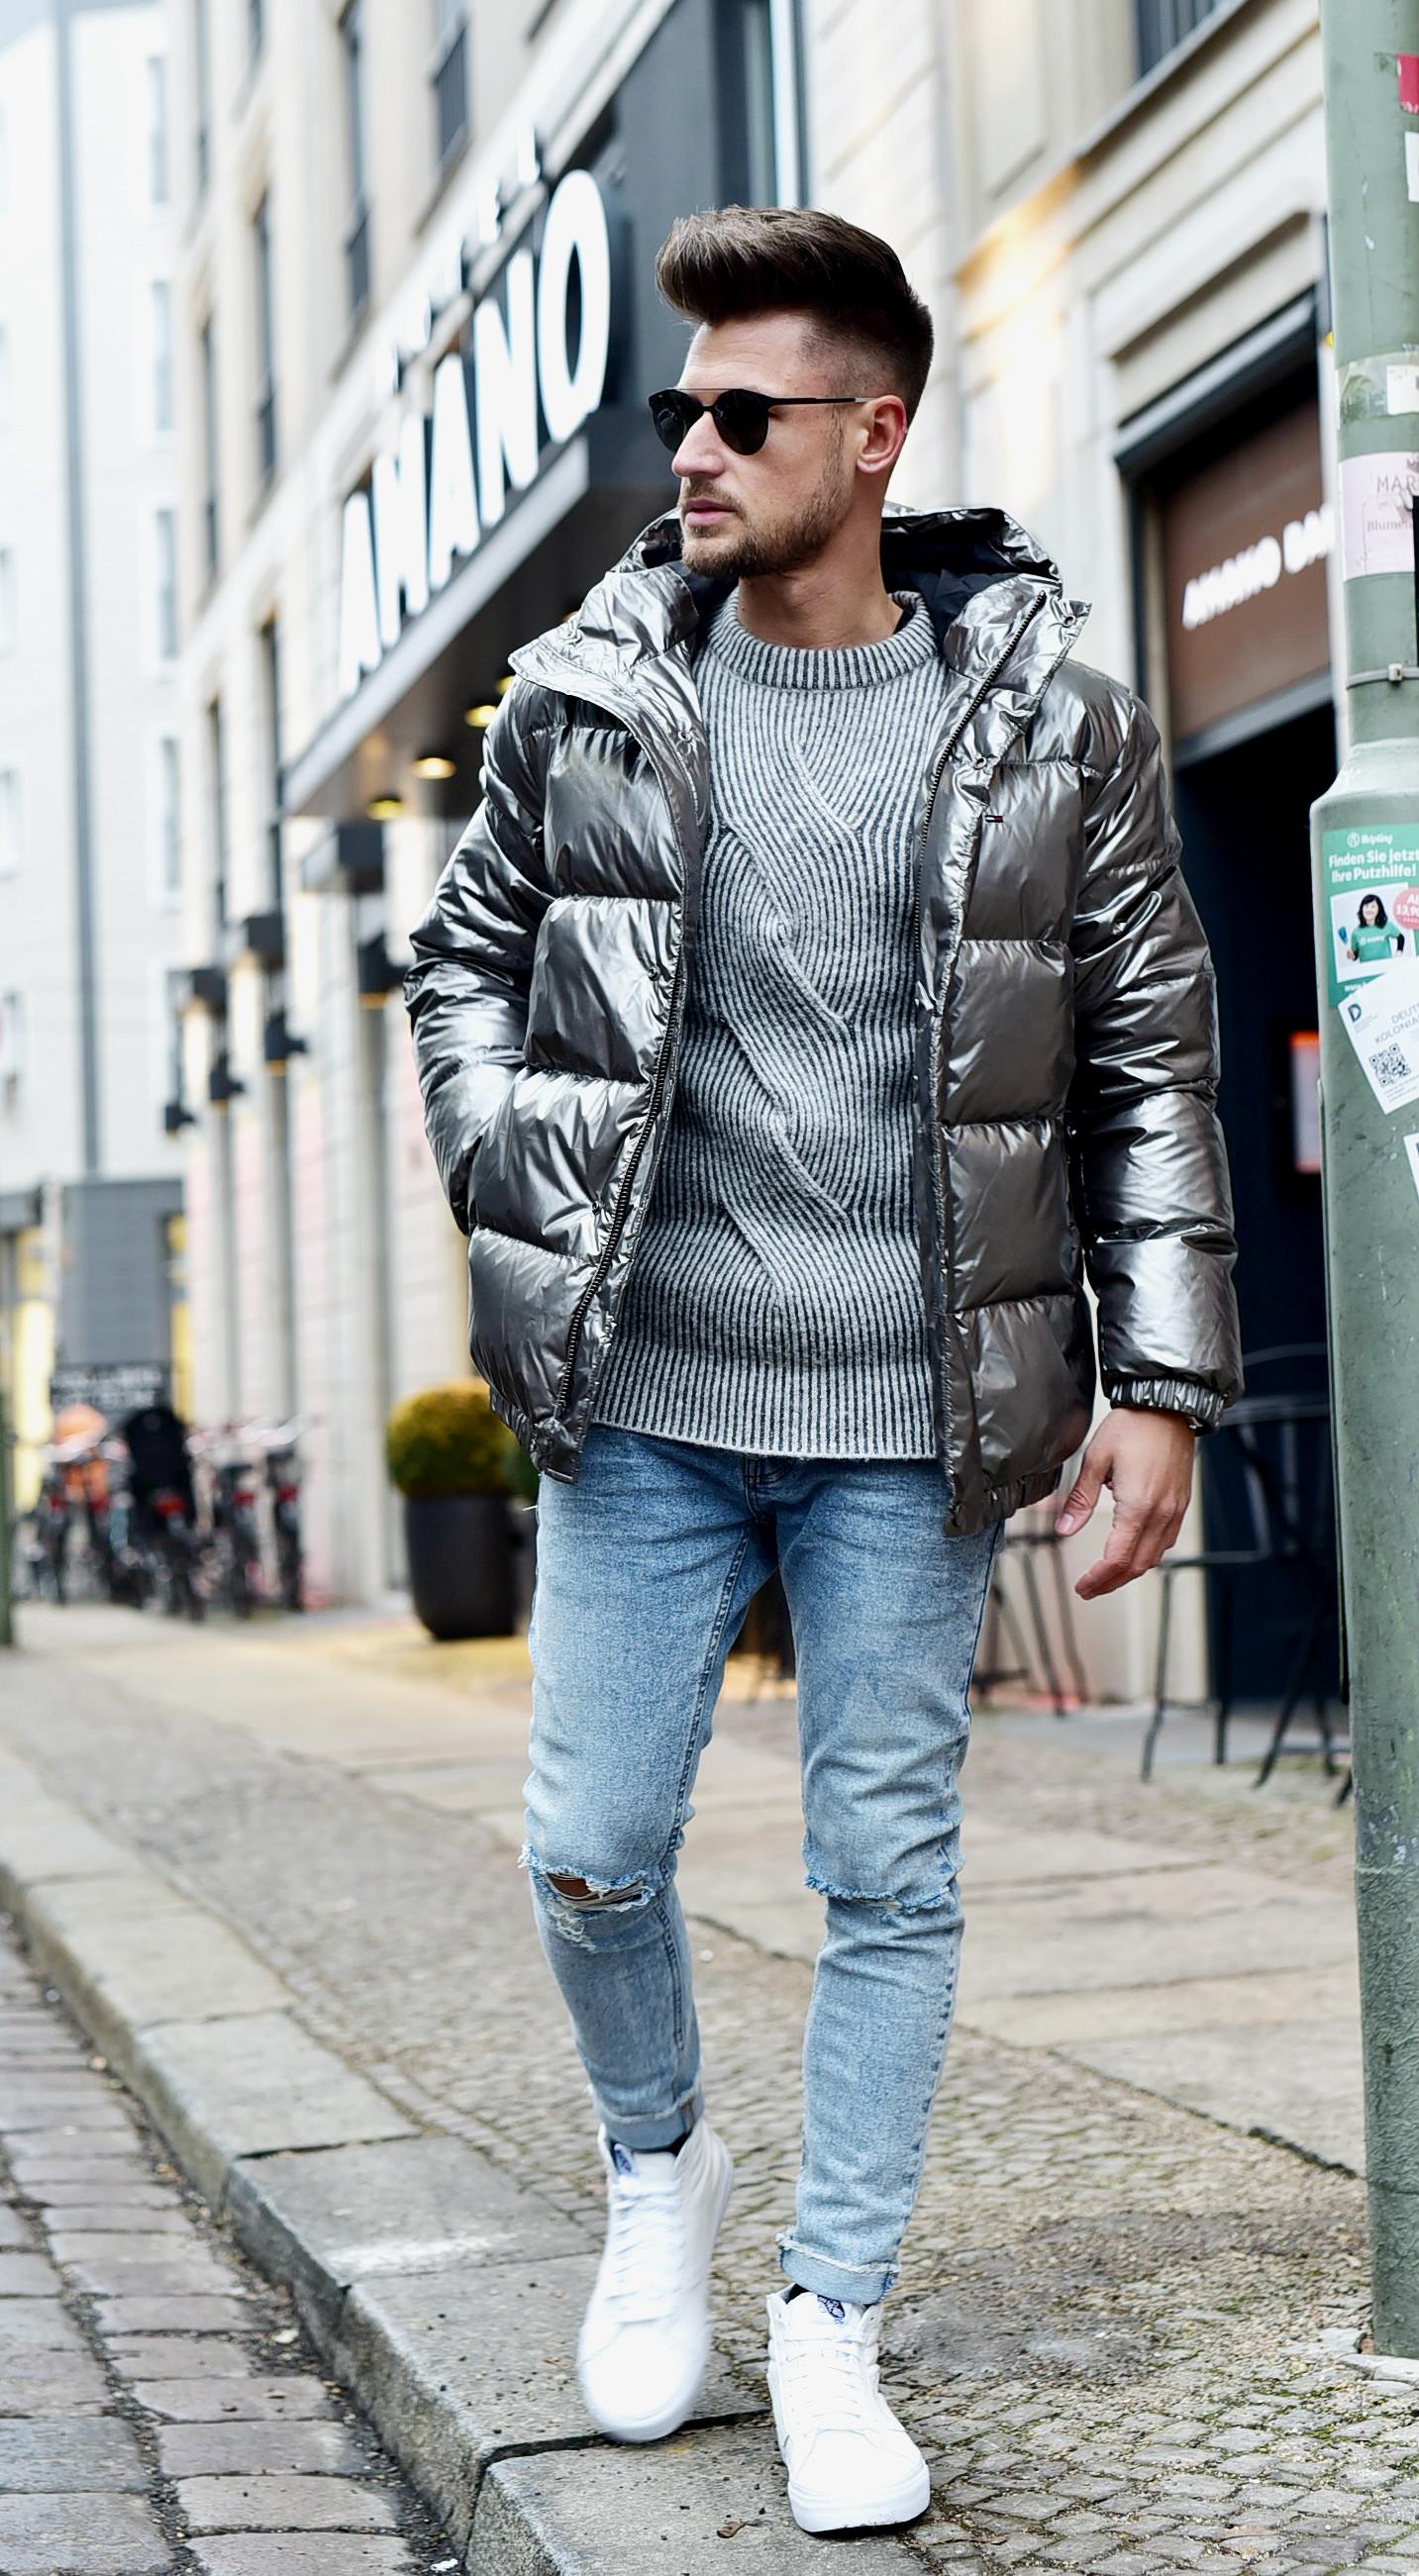 Tommeezjerry-Styleblog-Männerblog-Männer-Modeblog-Berlin-Berlinblog-Männermodeblog-Outfit-Sneaker-Vans-Tommy-Hilfiger-Winterjacke-Skinny-Jeans